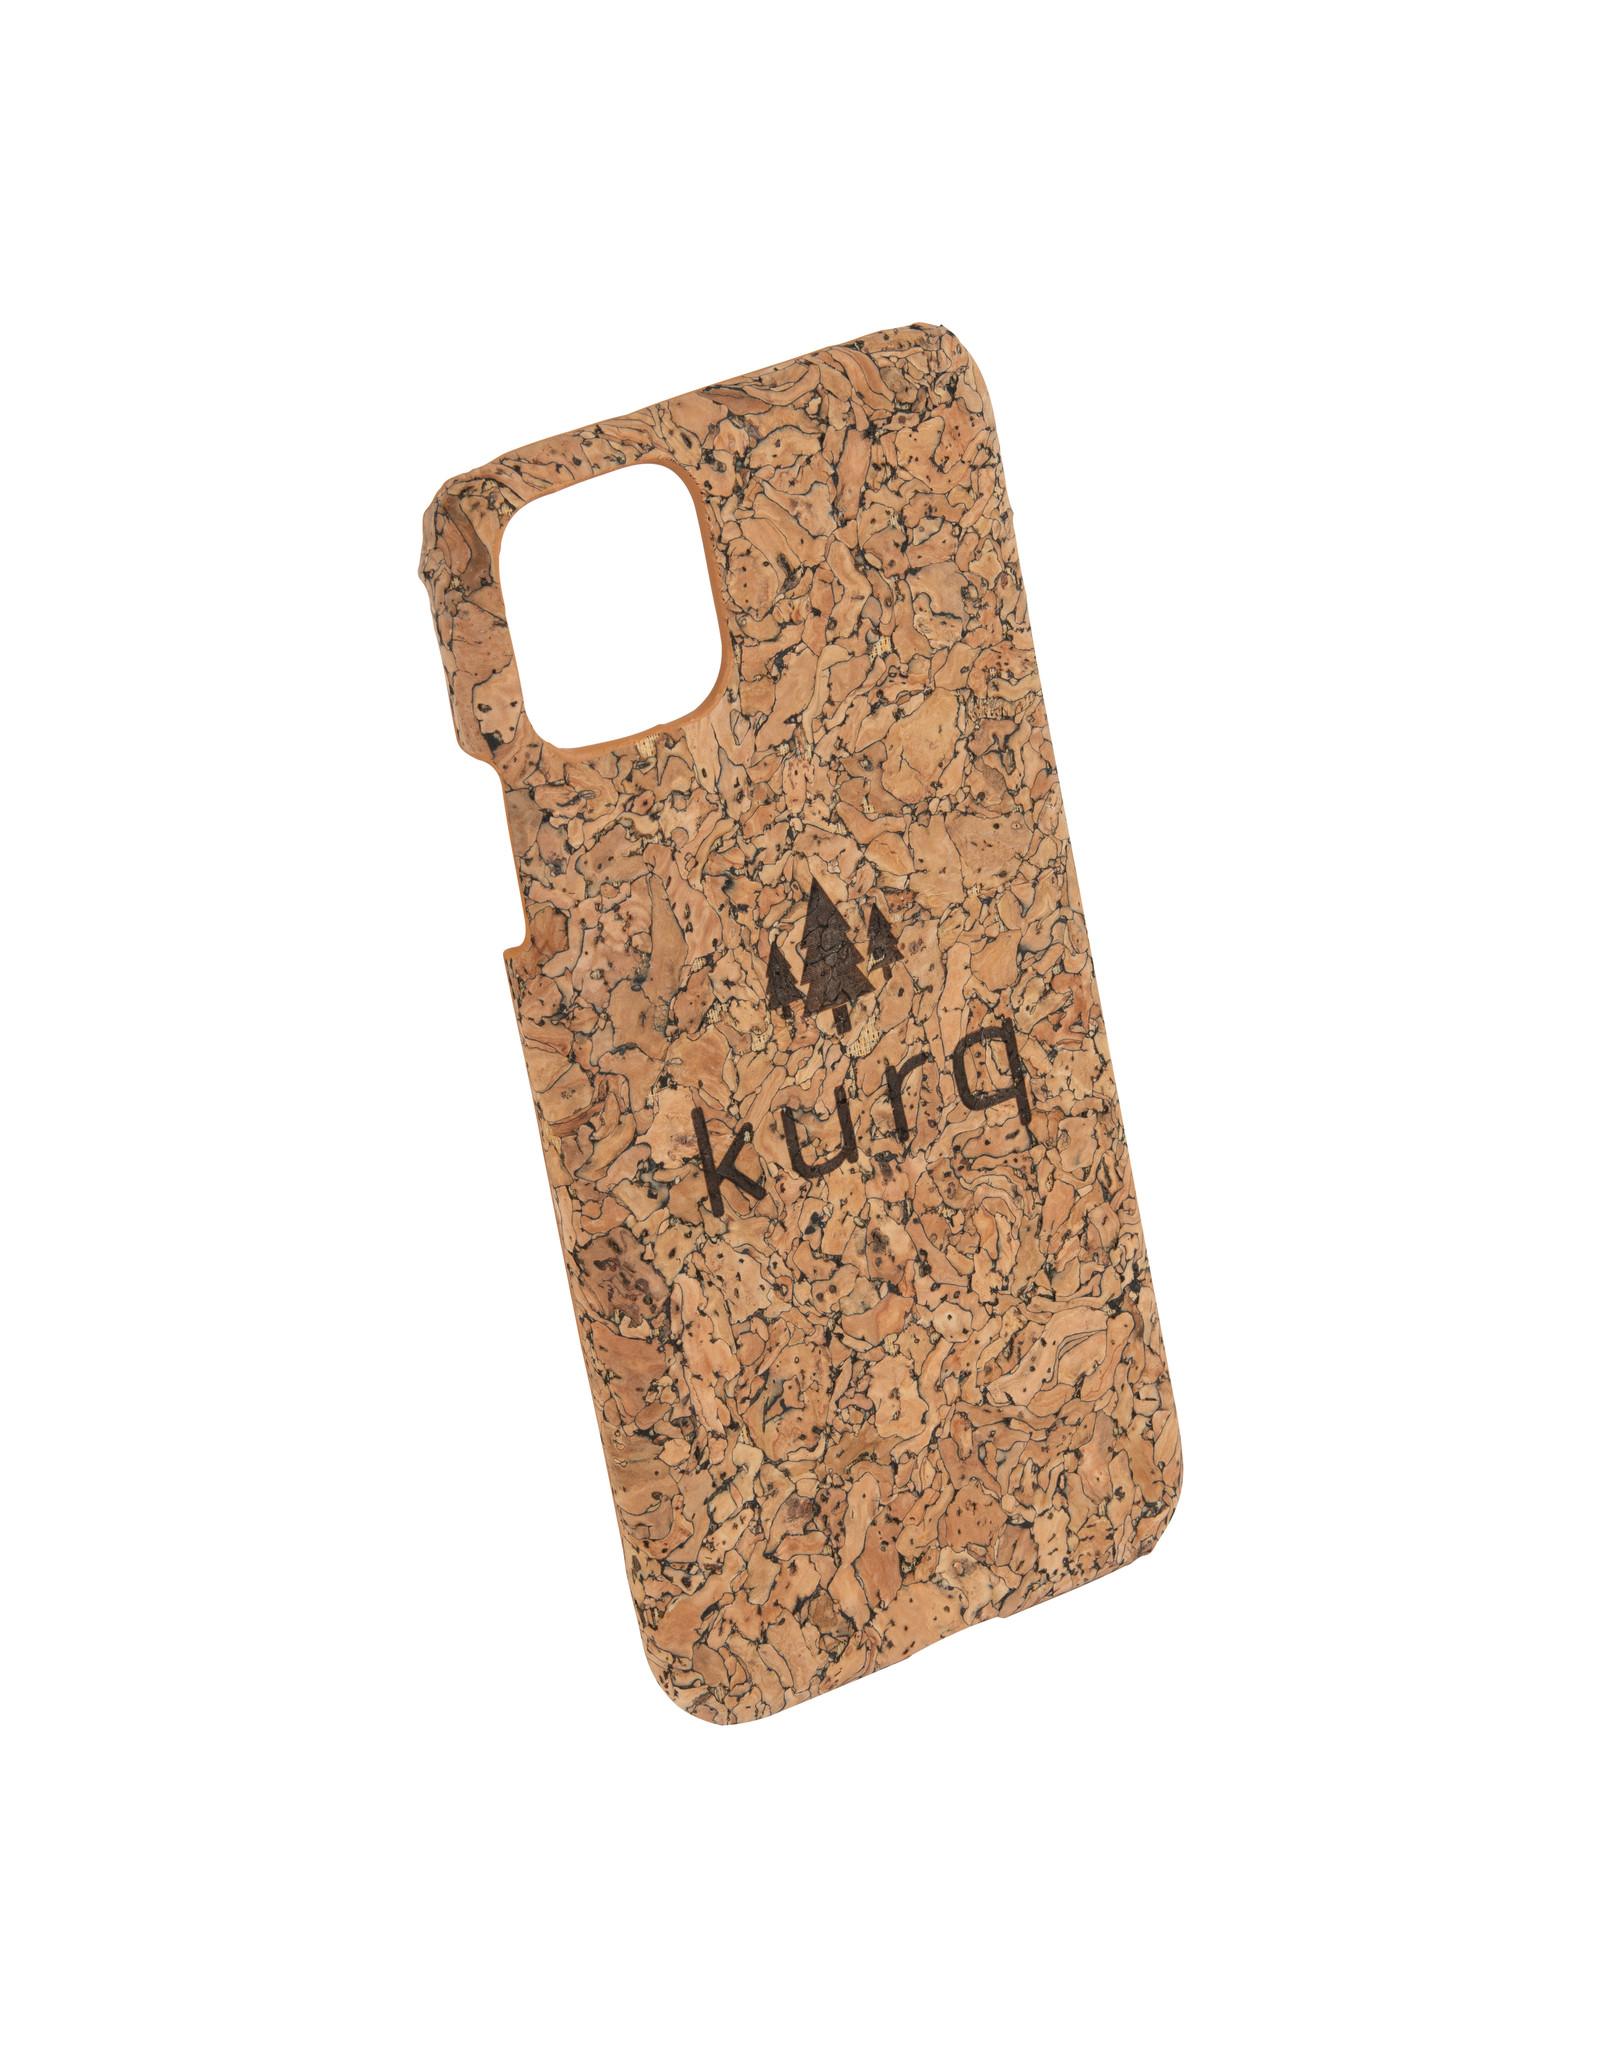 KURQ - Cork phone case for iPhone 11 Pro Max